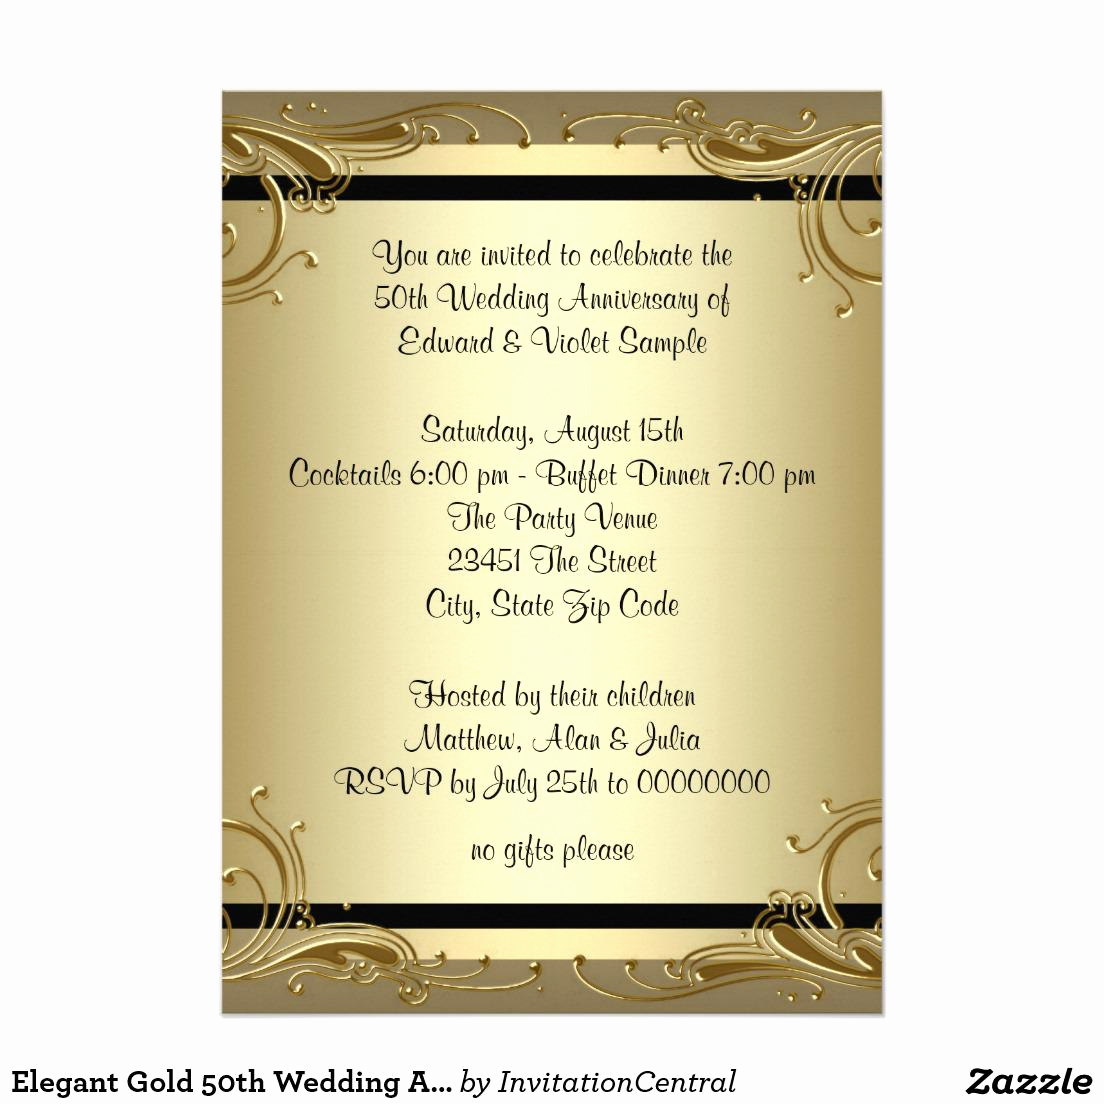 Anniversary Party Invitation Wording Unique Golden Wedding Anniversary Invitations 50th Wedding